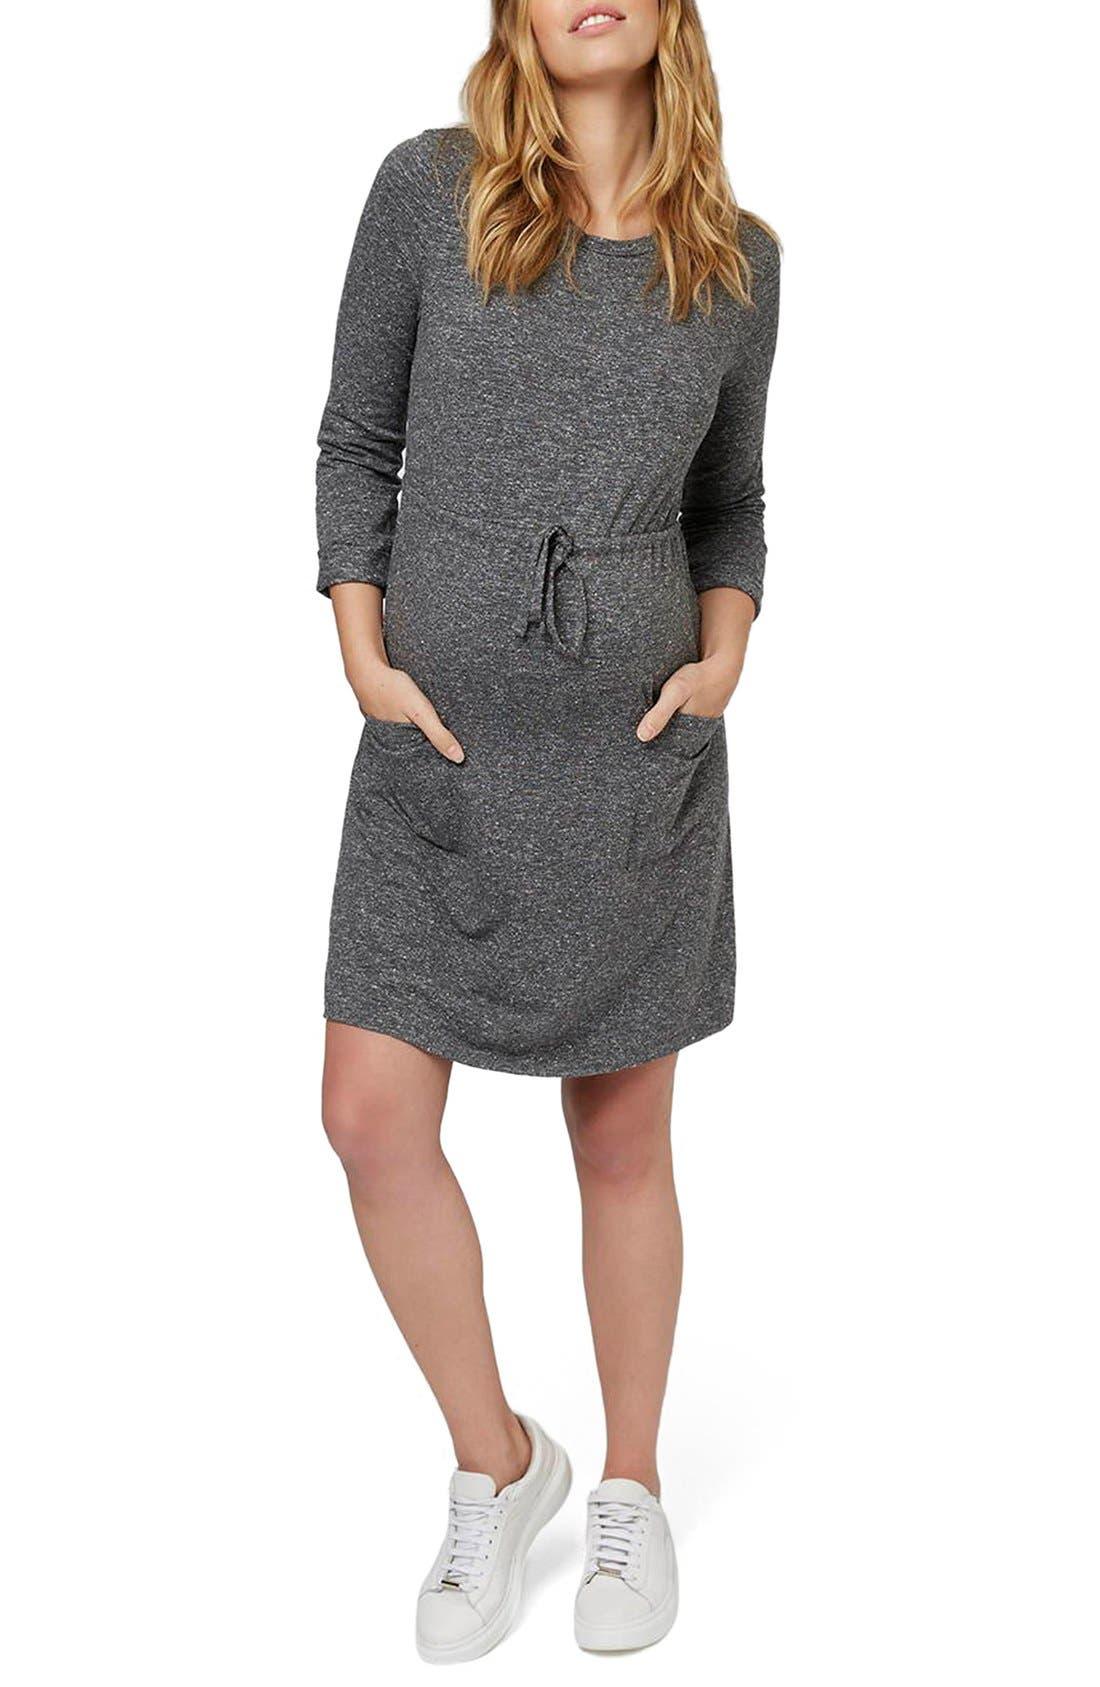 Alternate Image 1 Selected - Topshop Drawstring Maternity Dress